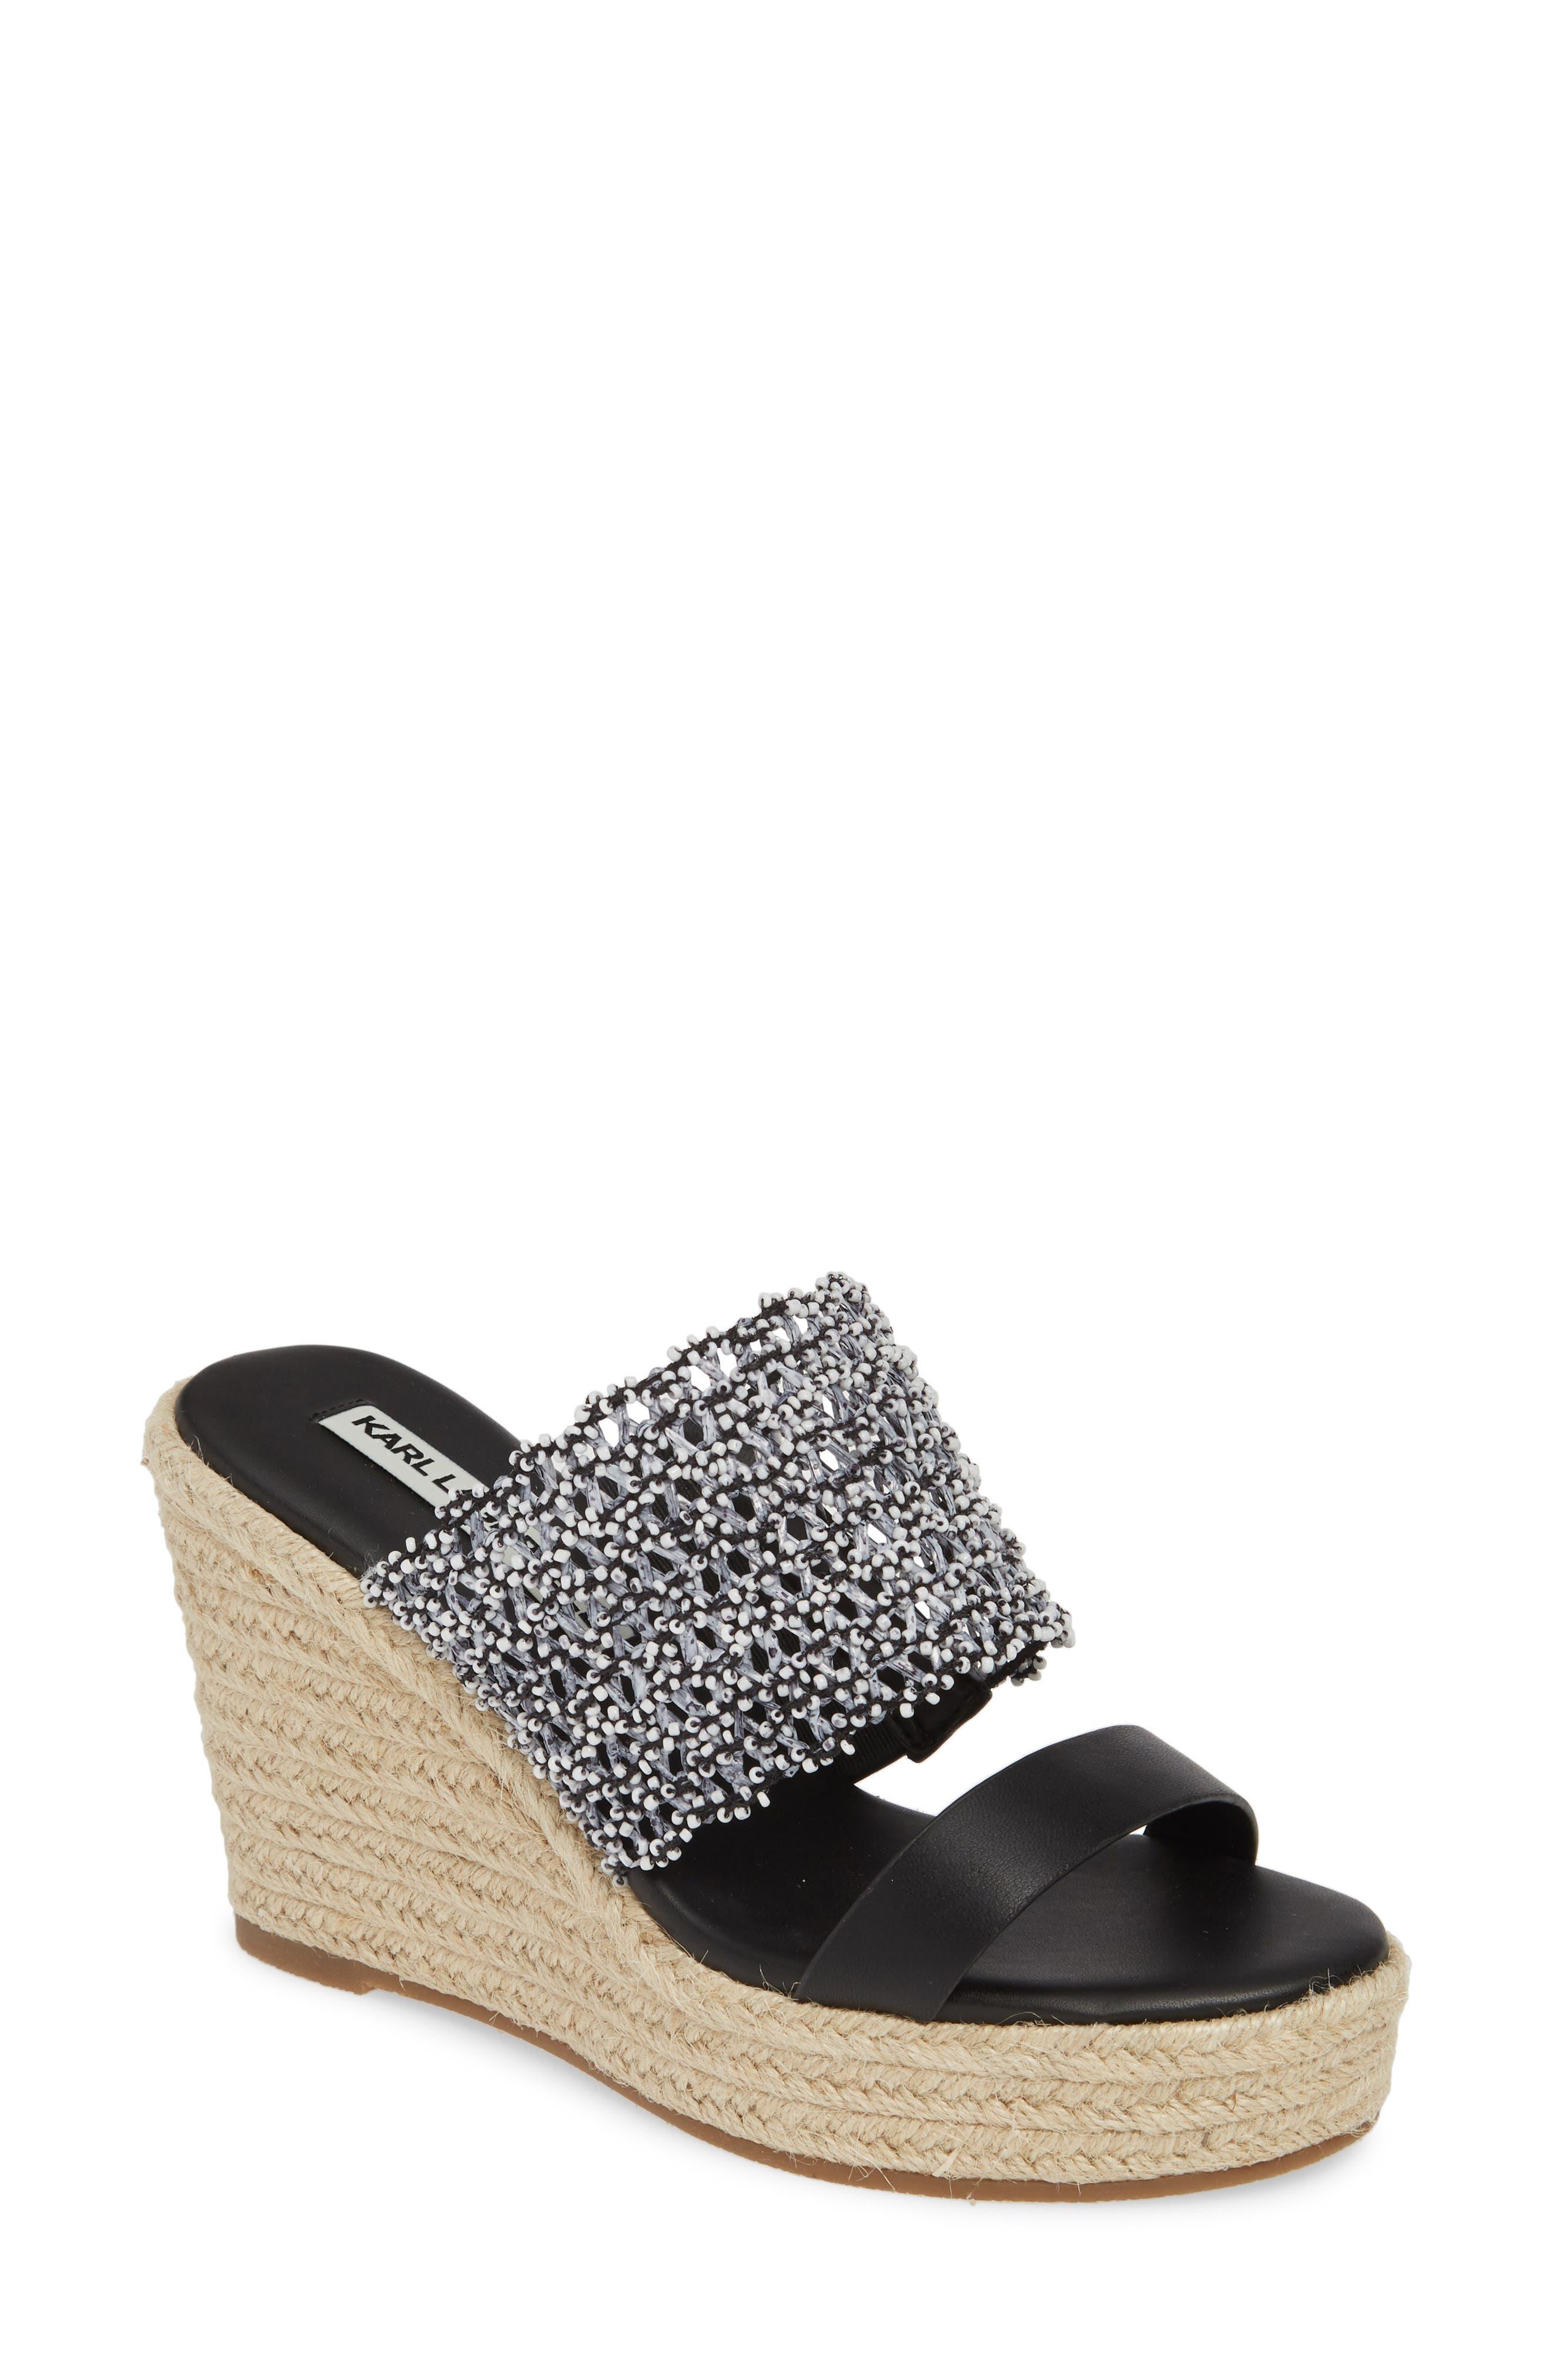 Karl Lagerfeld Paris Celie Espadrille Wedge Slide Sandal, Black